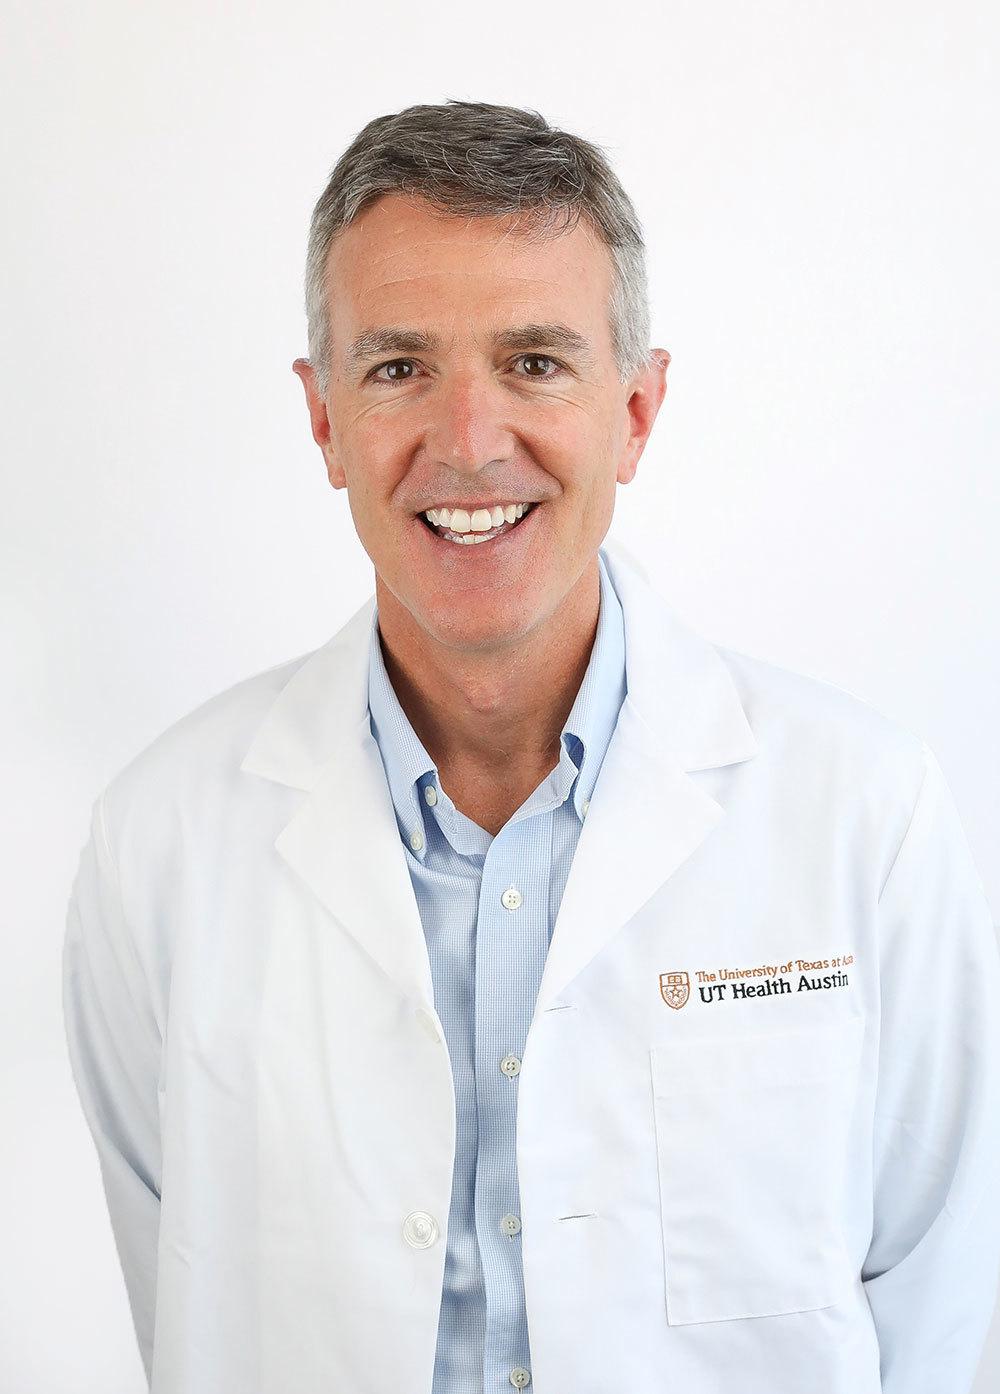 David Ring at UT Health Austin